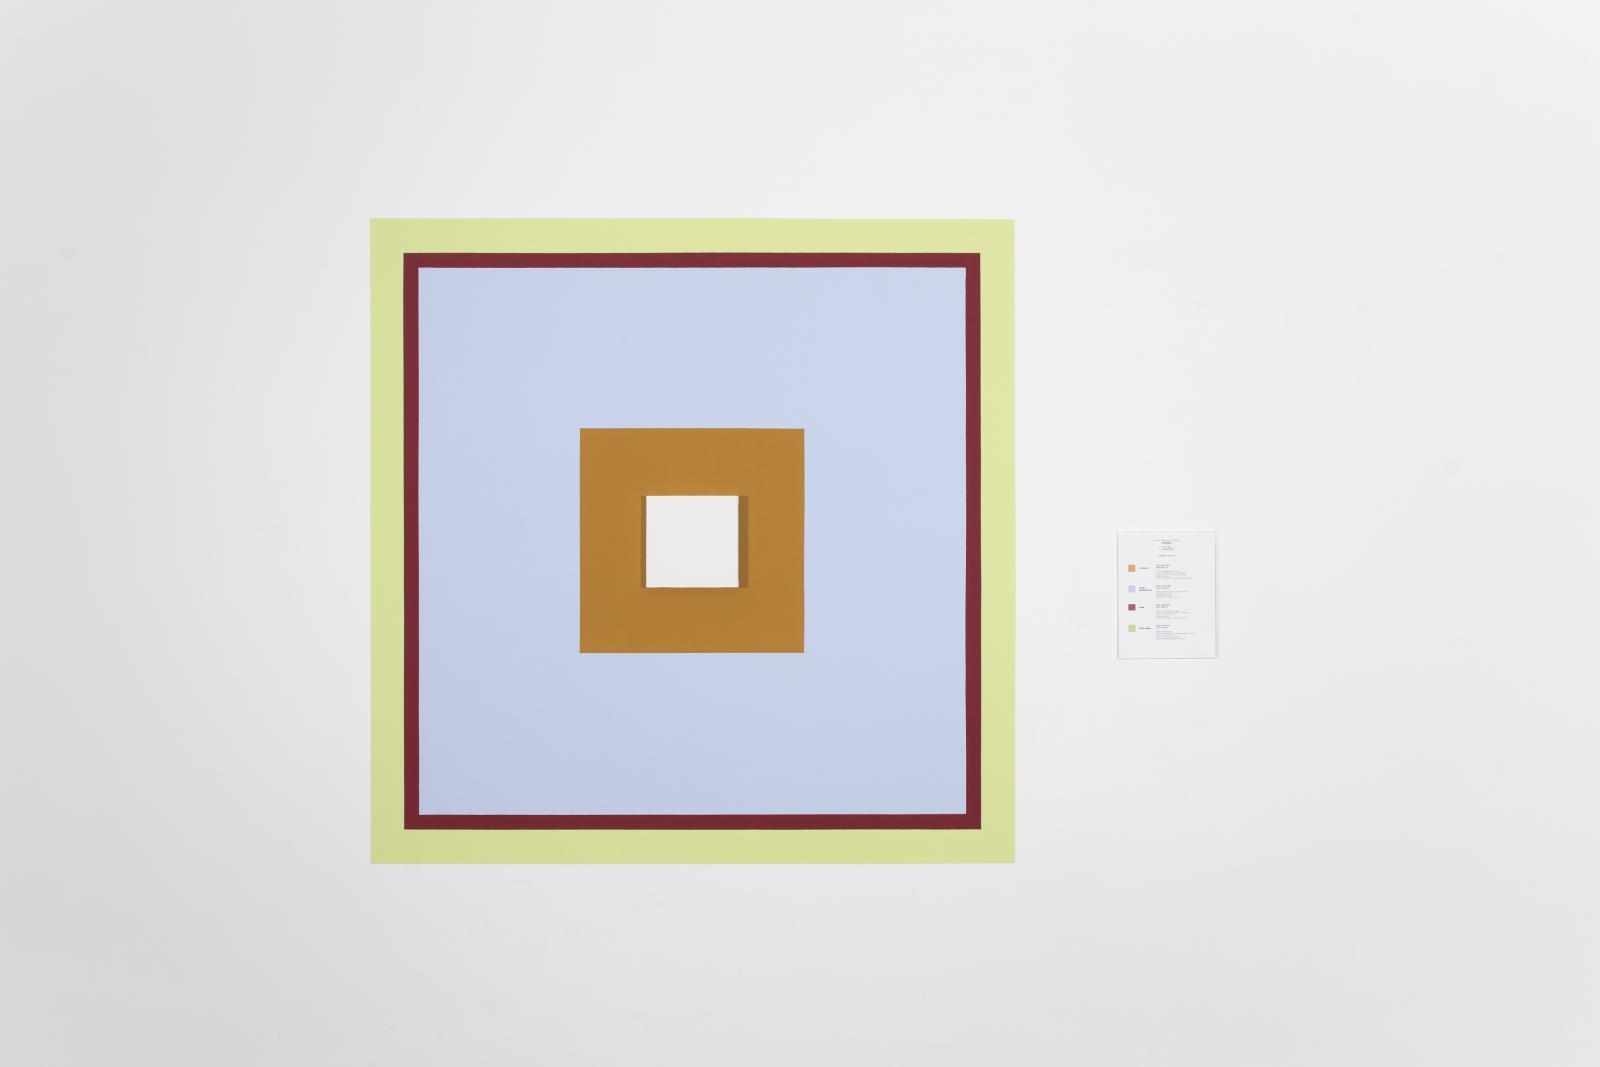 ARCOmadrid 2018 - Risk Management Paintings series (2018) - Cristina Garrido